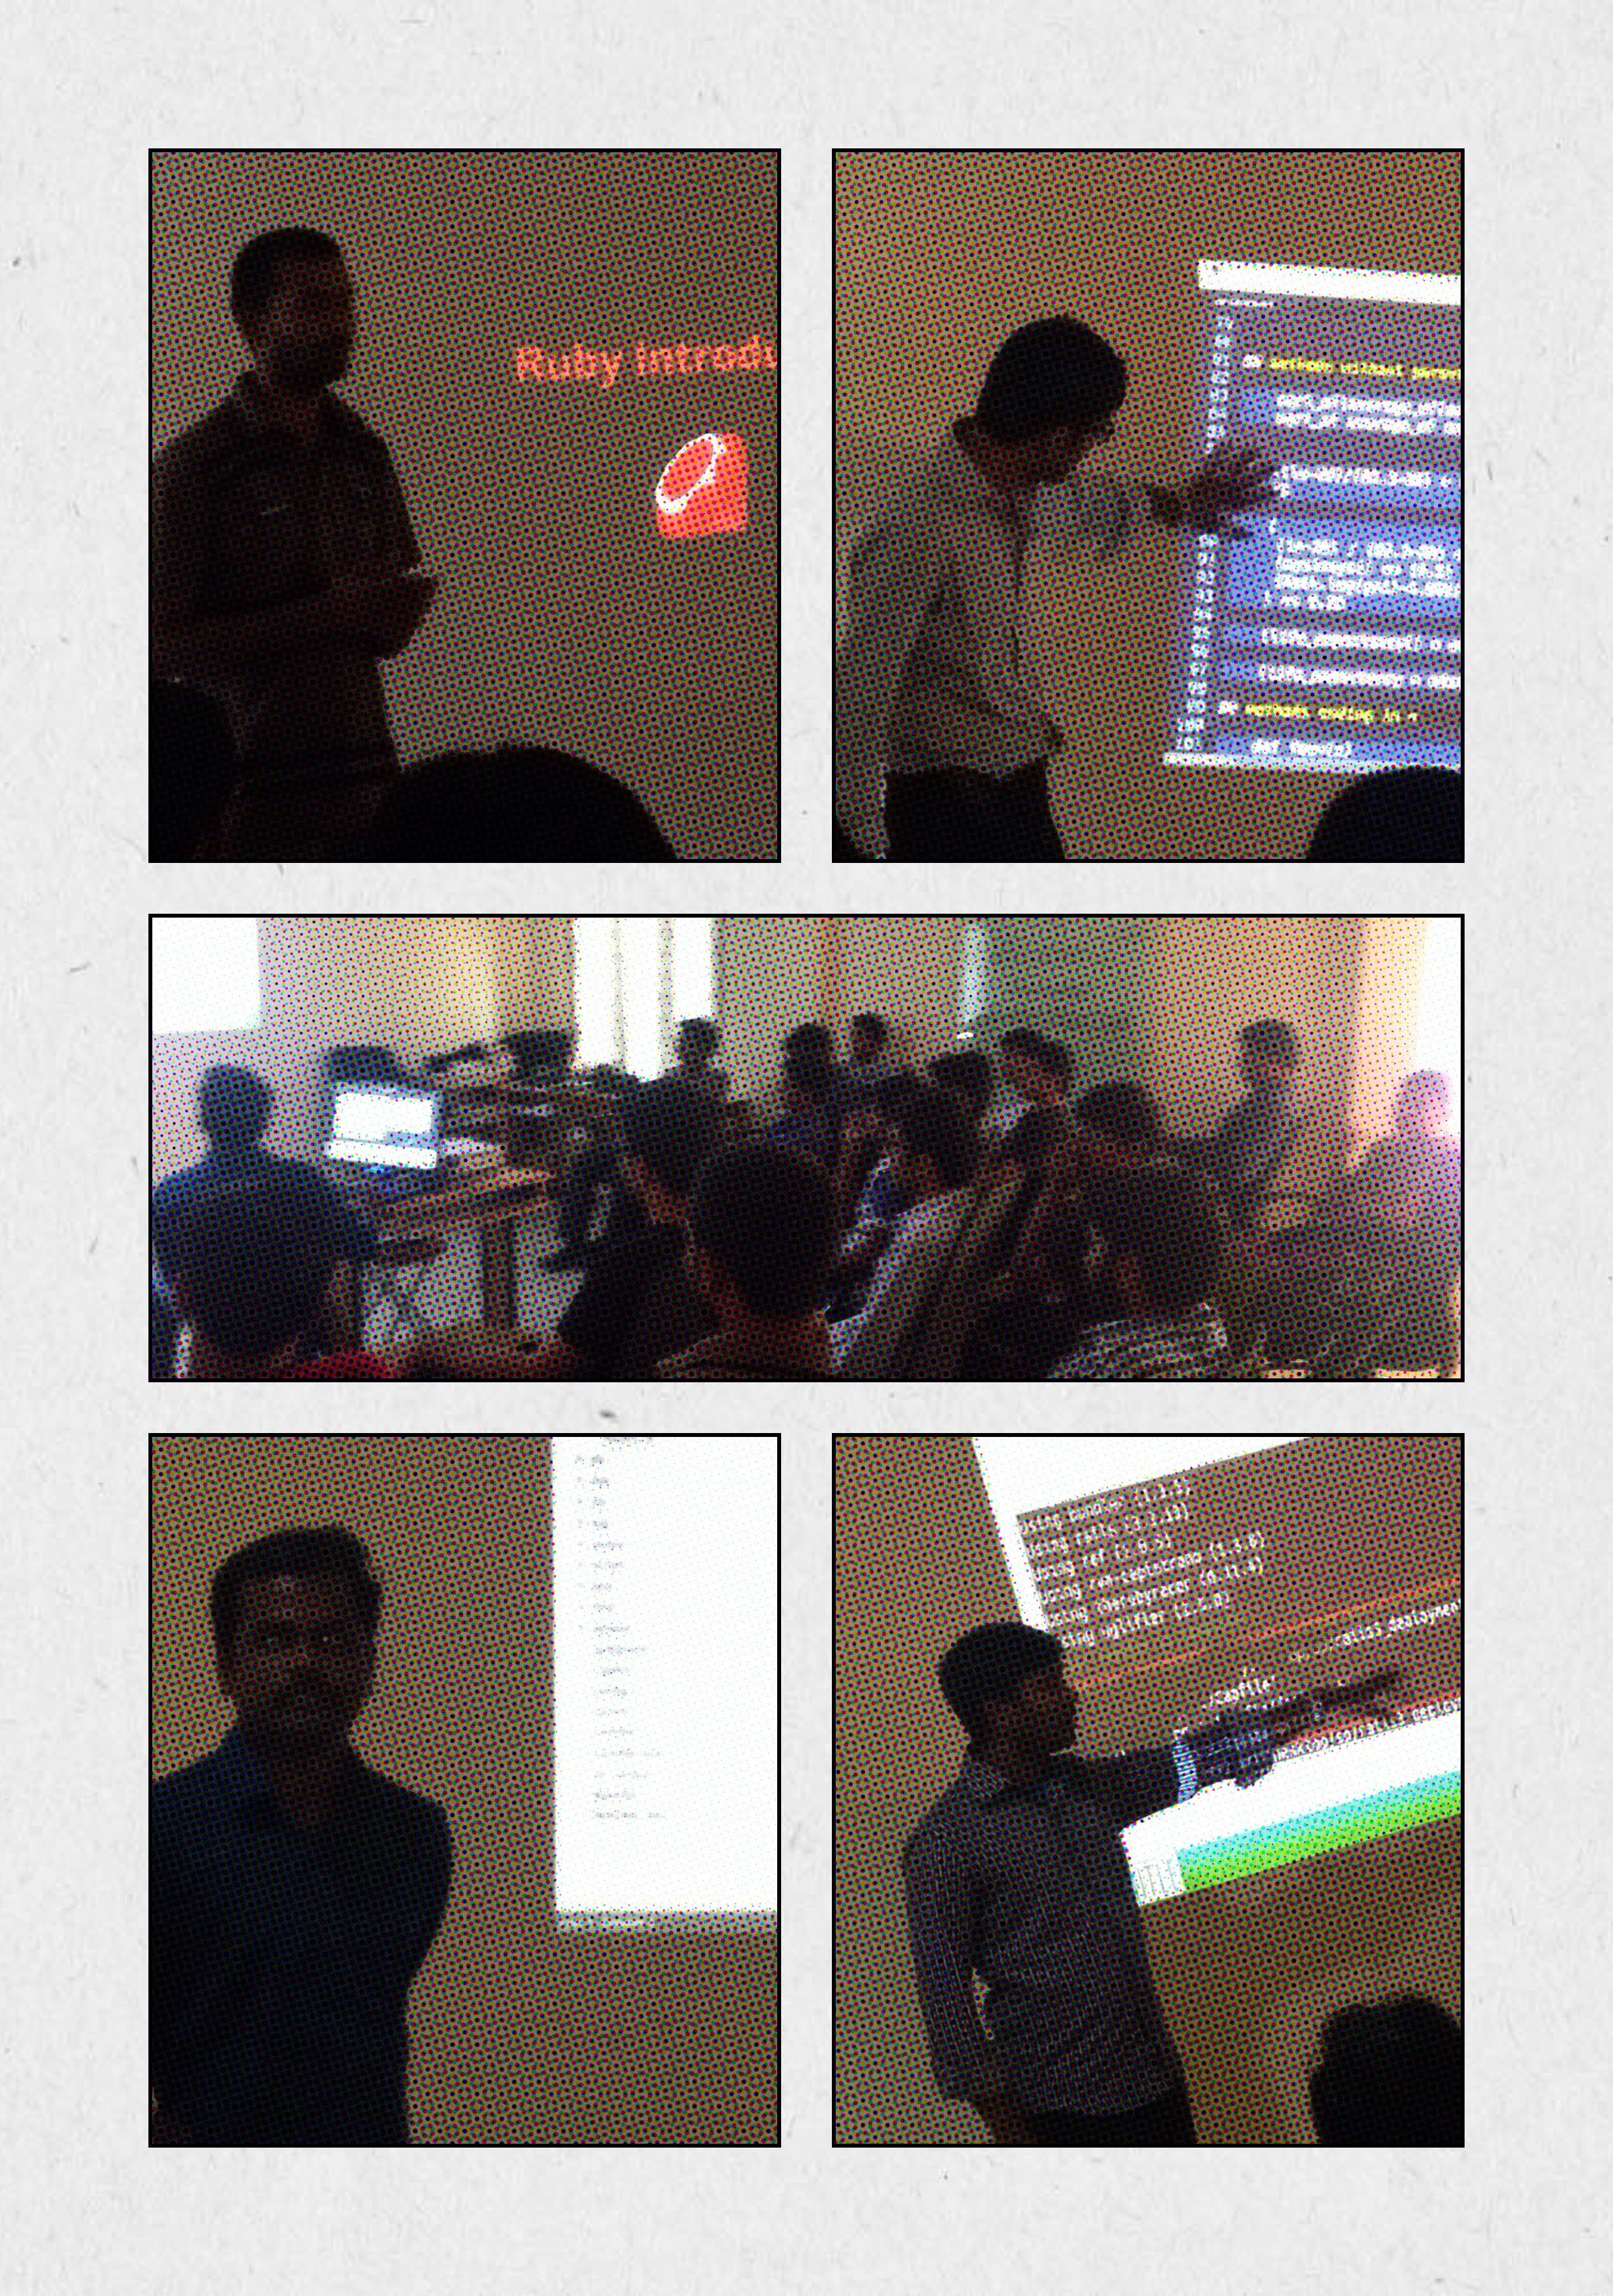 Chennai.rb Ruby User Group